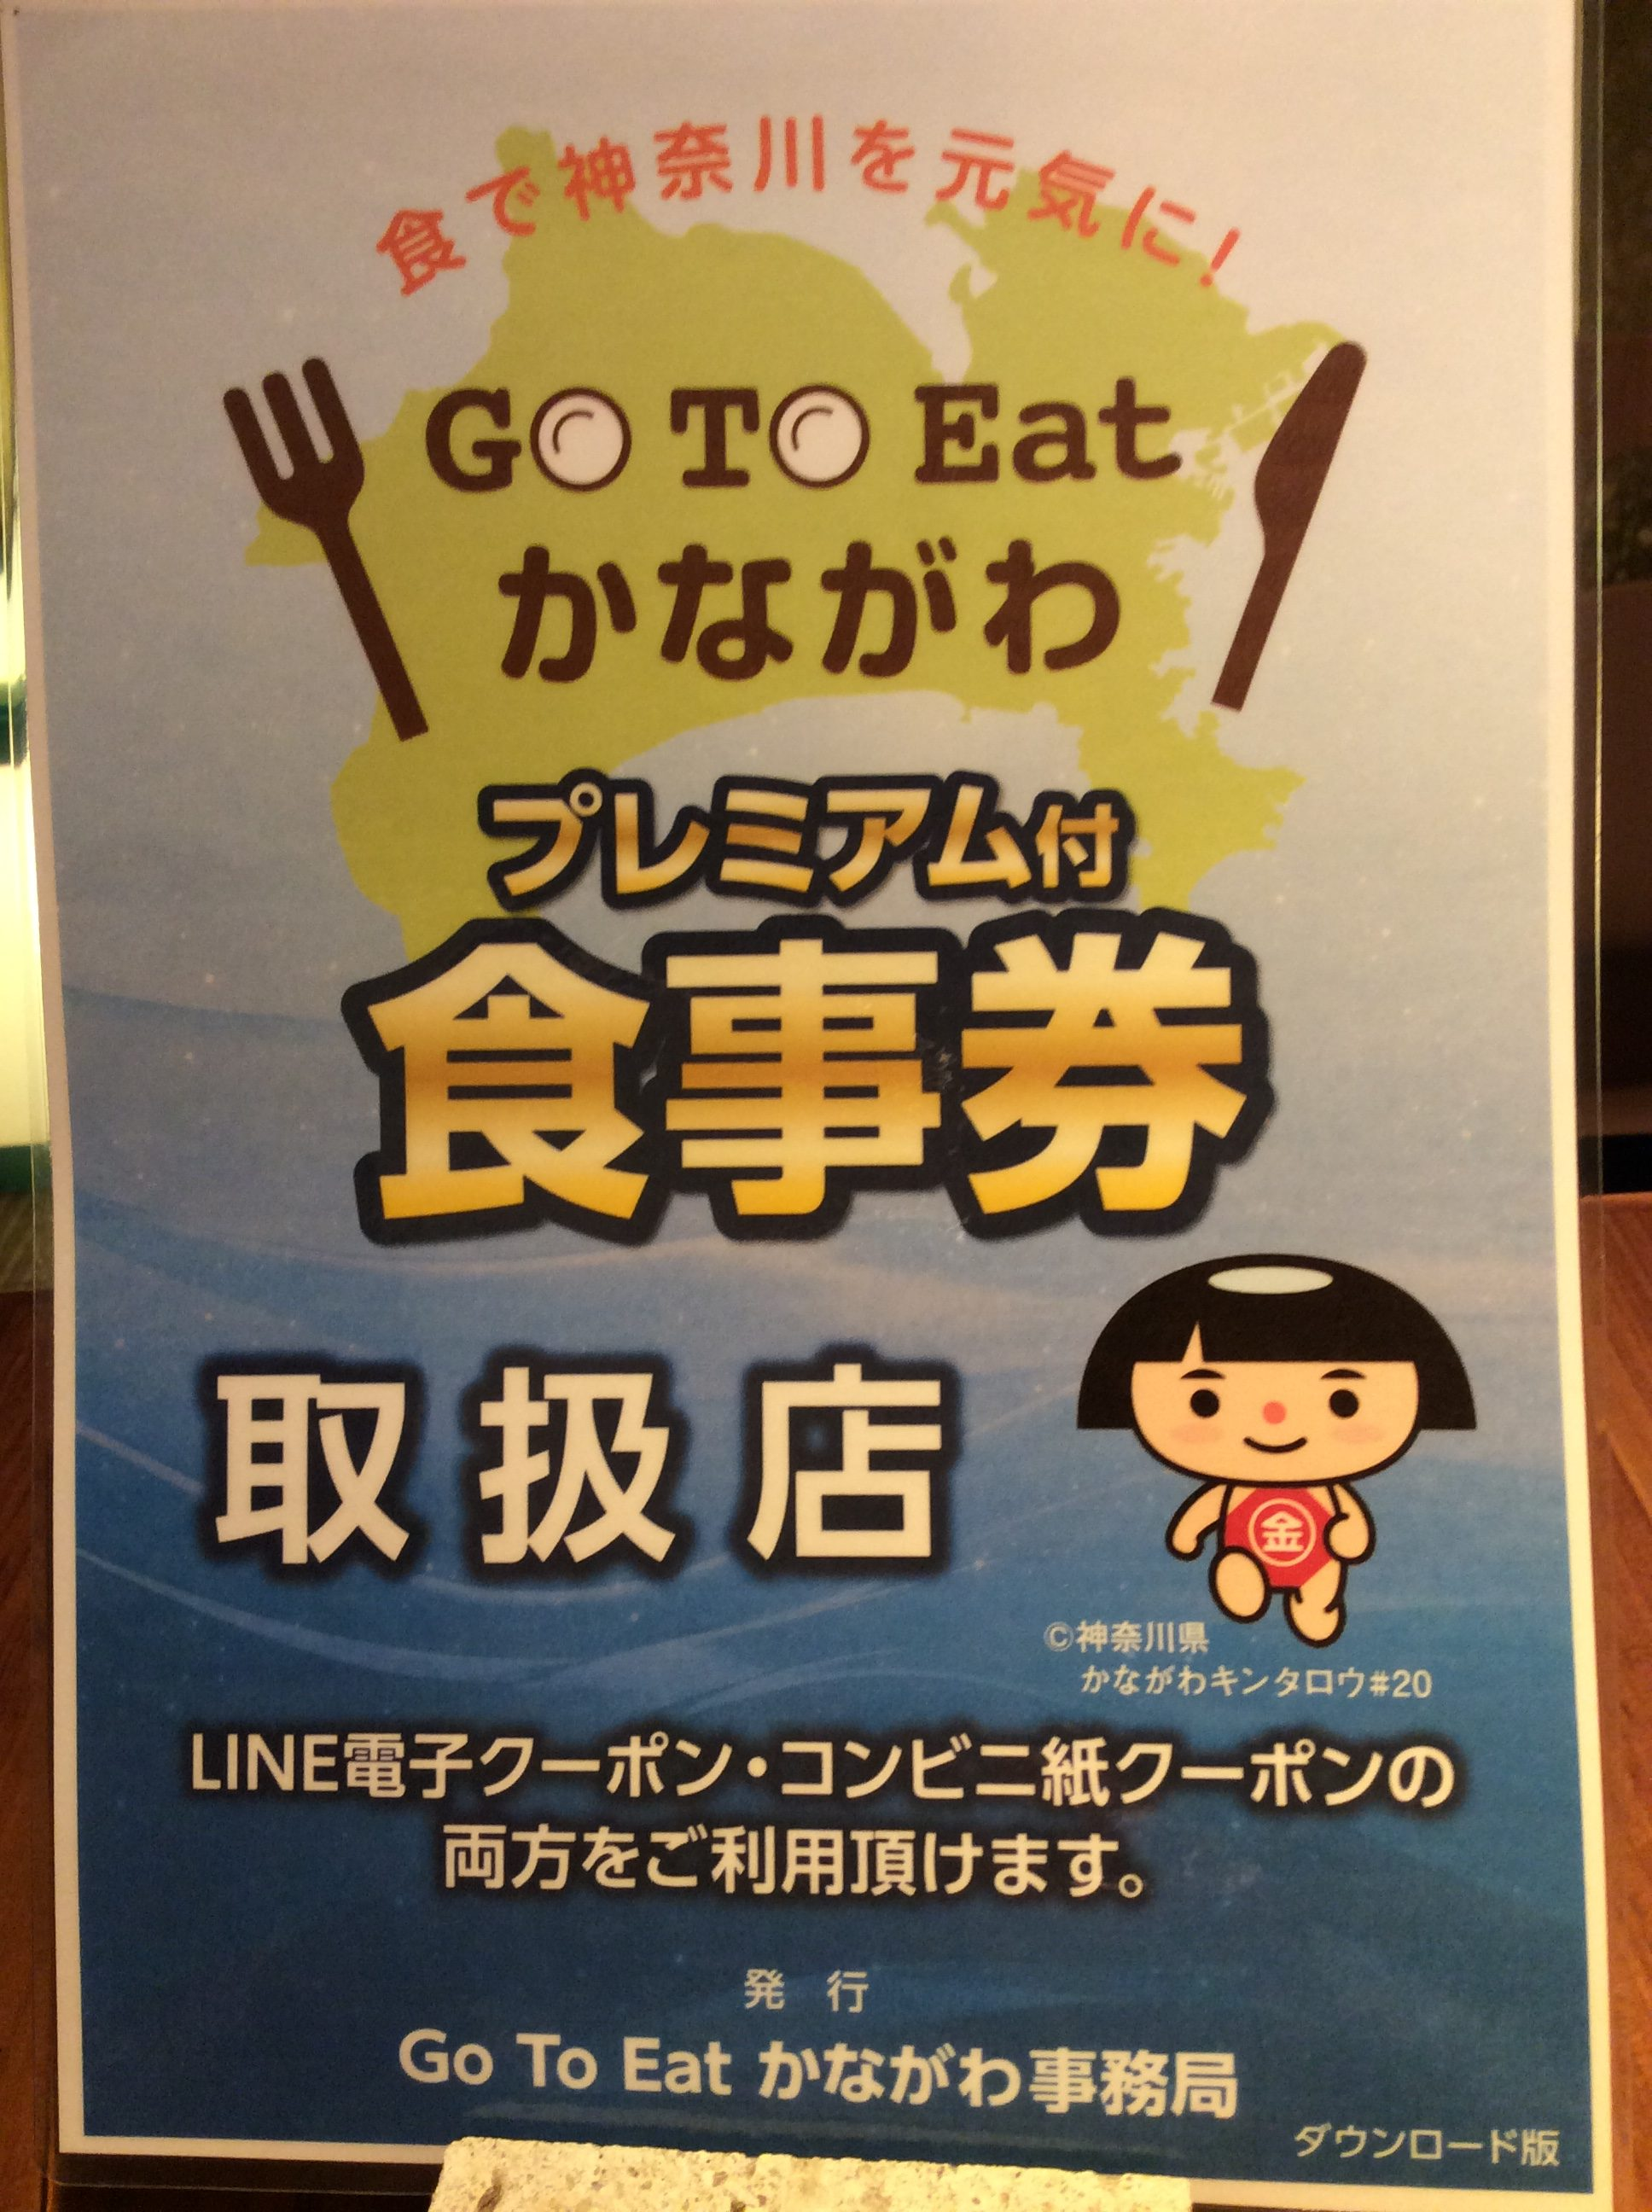 GoToEat加盟店の[円居 -MADOy- 横浜関内]